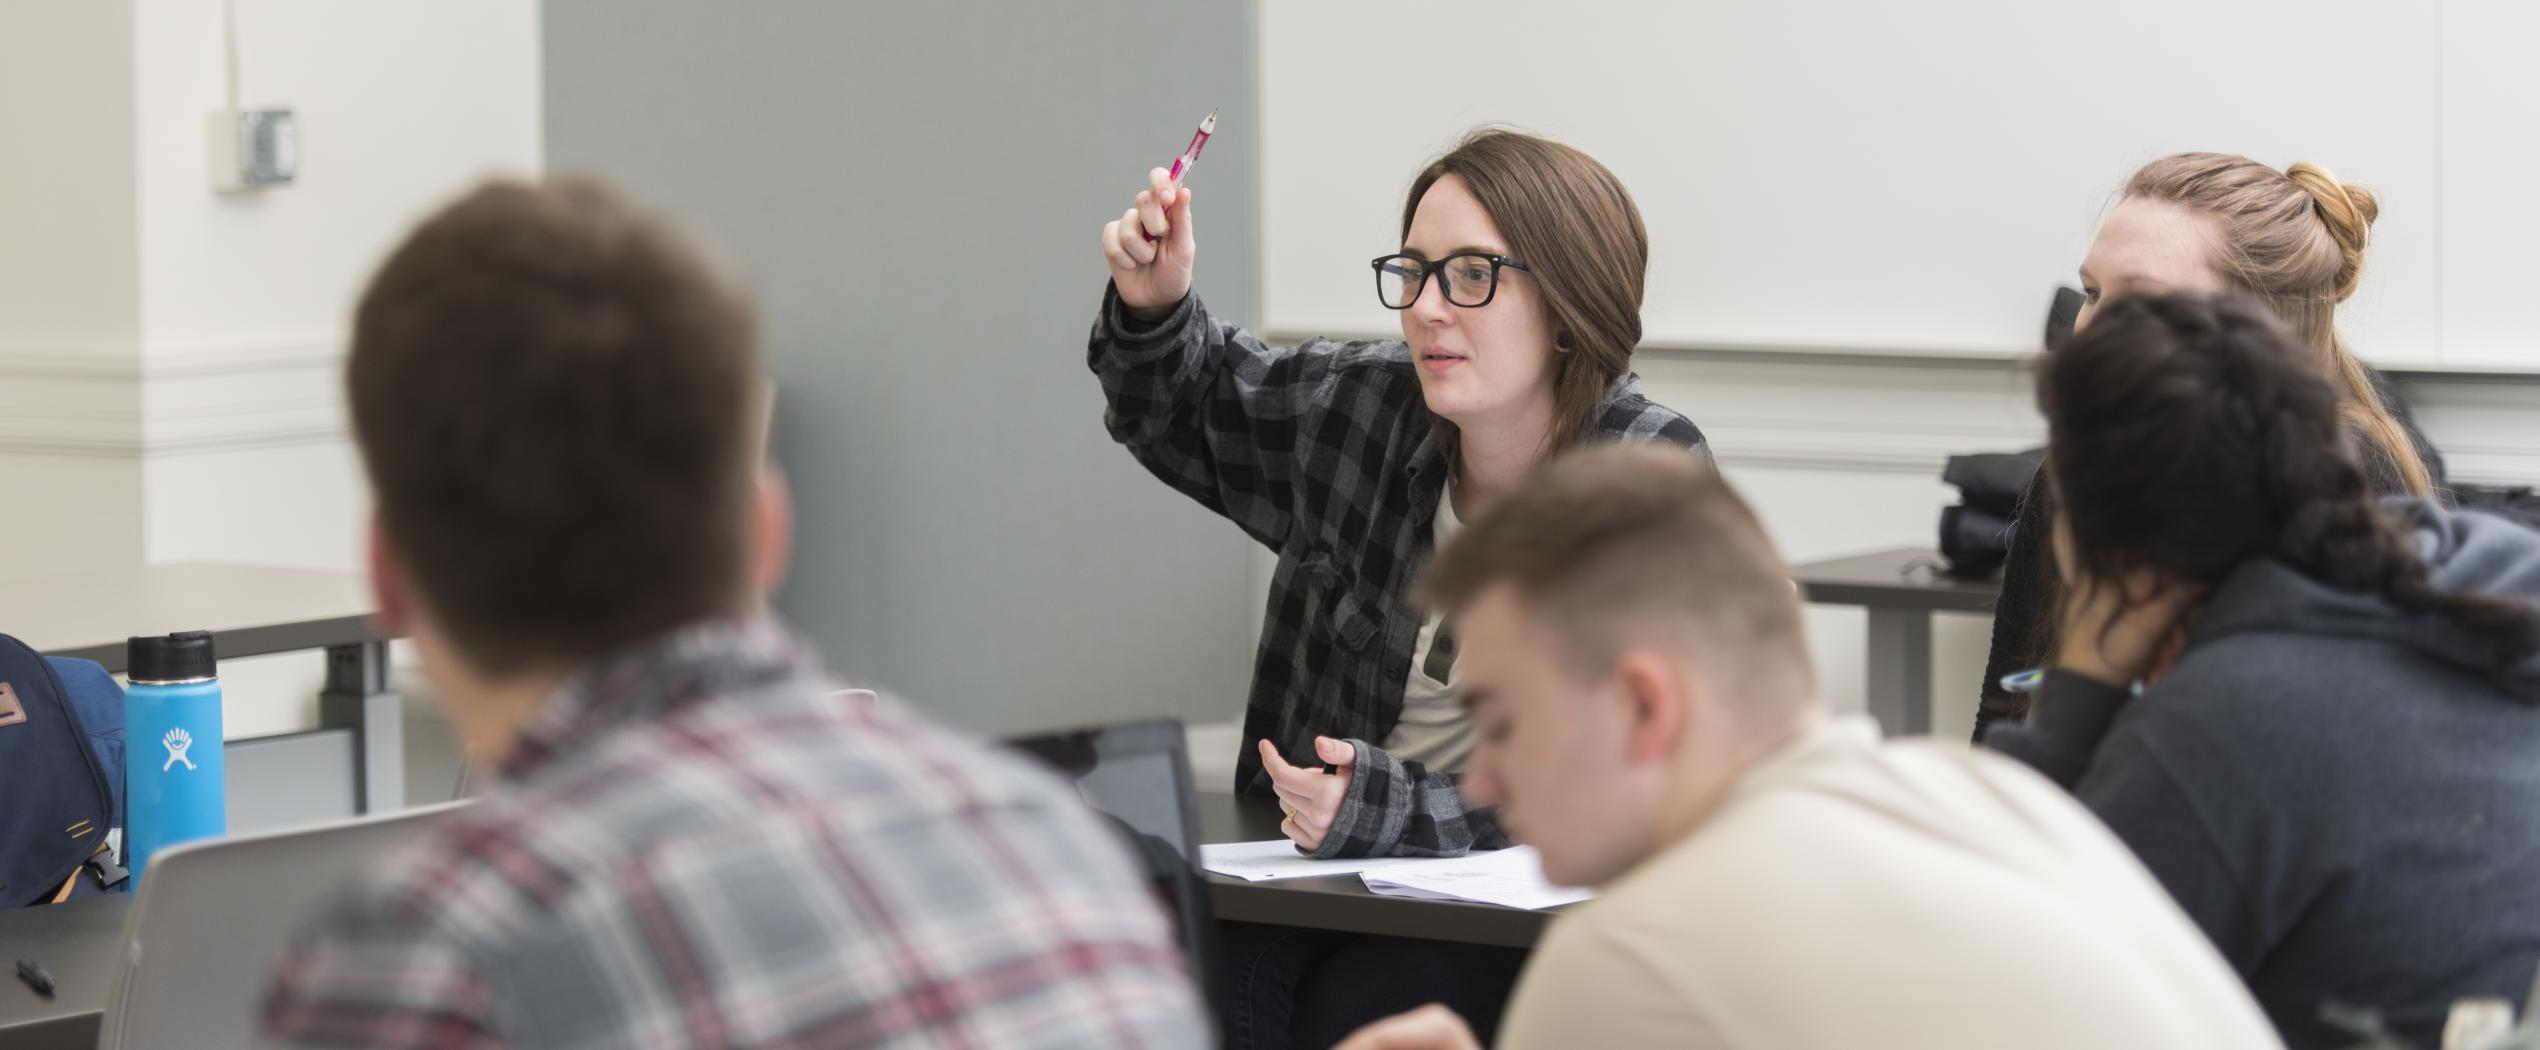 female student raising her hand in class